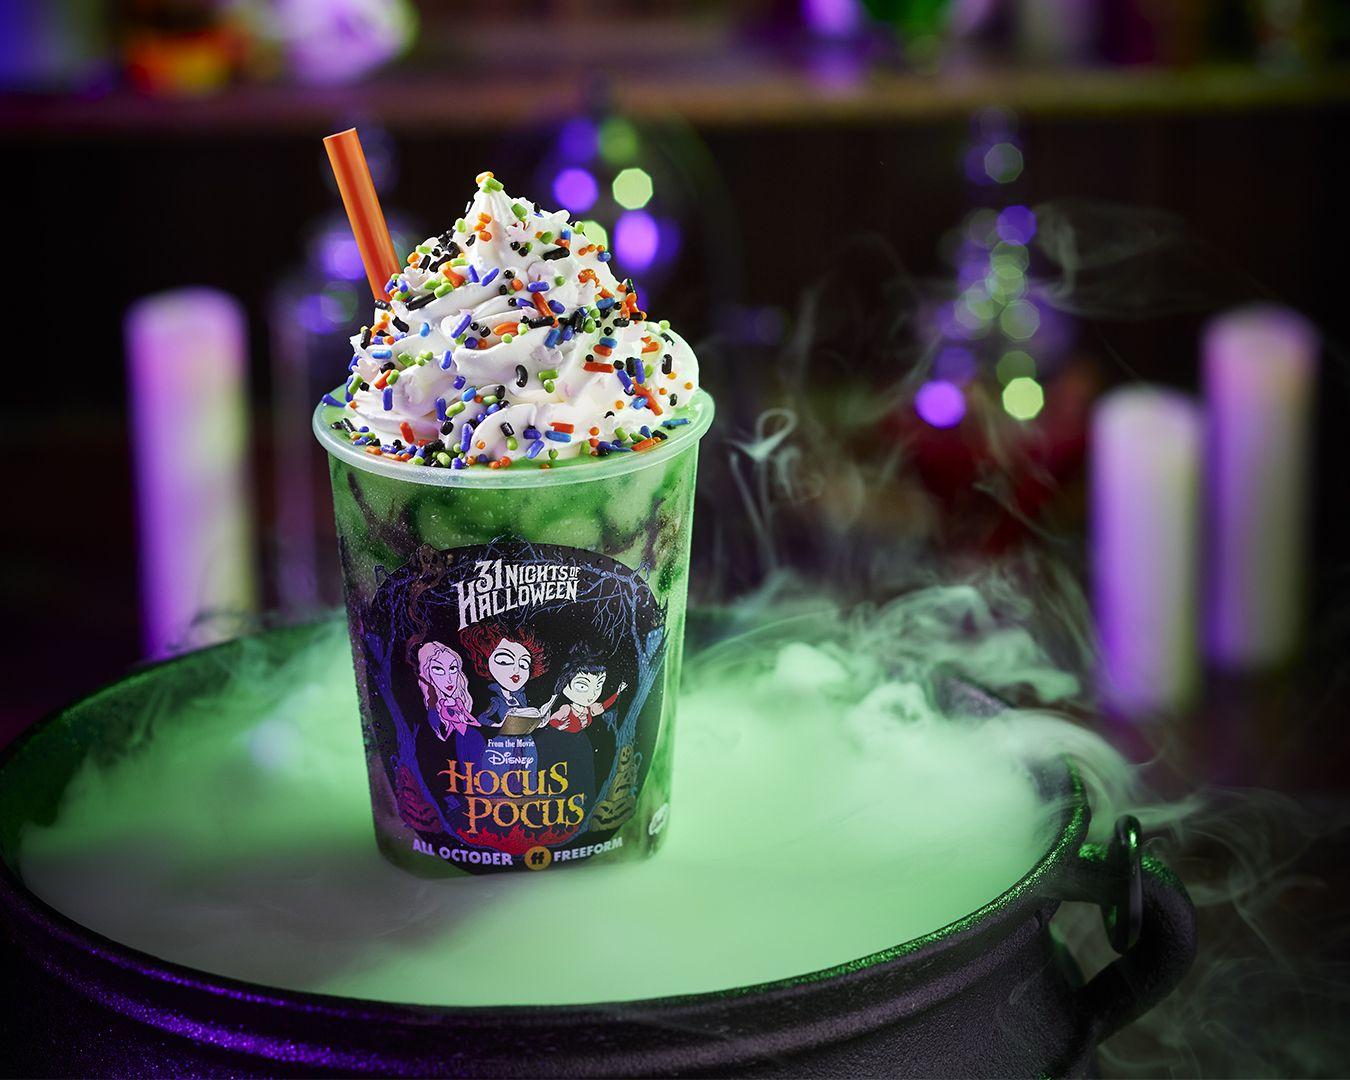 Freeform and Carvel Ice Cream Create Hocus Pocus Shake for 31 Nights of Halloween. Credit: Carvel